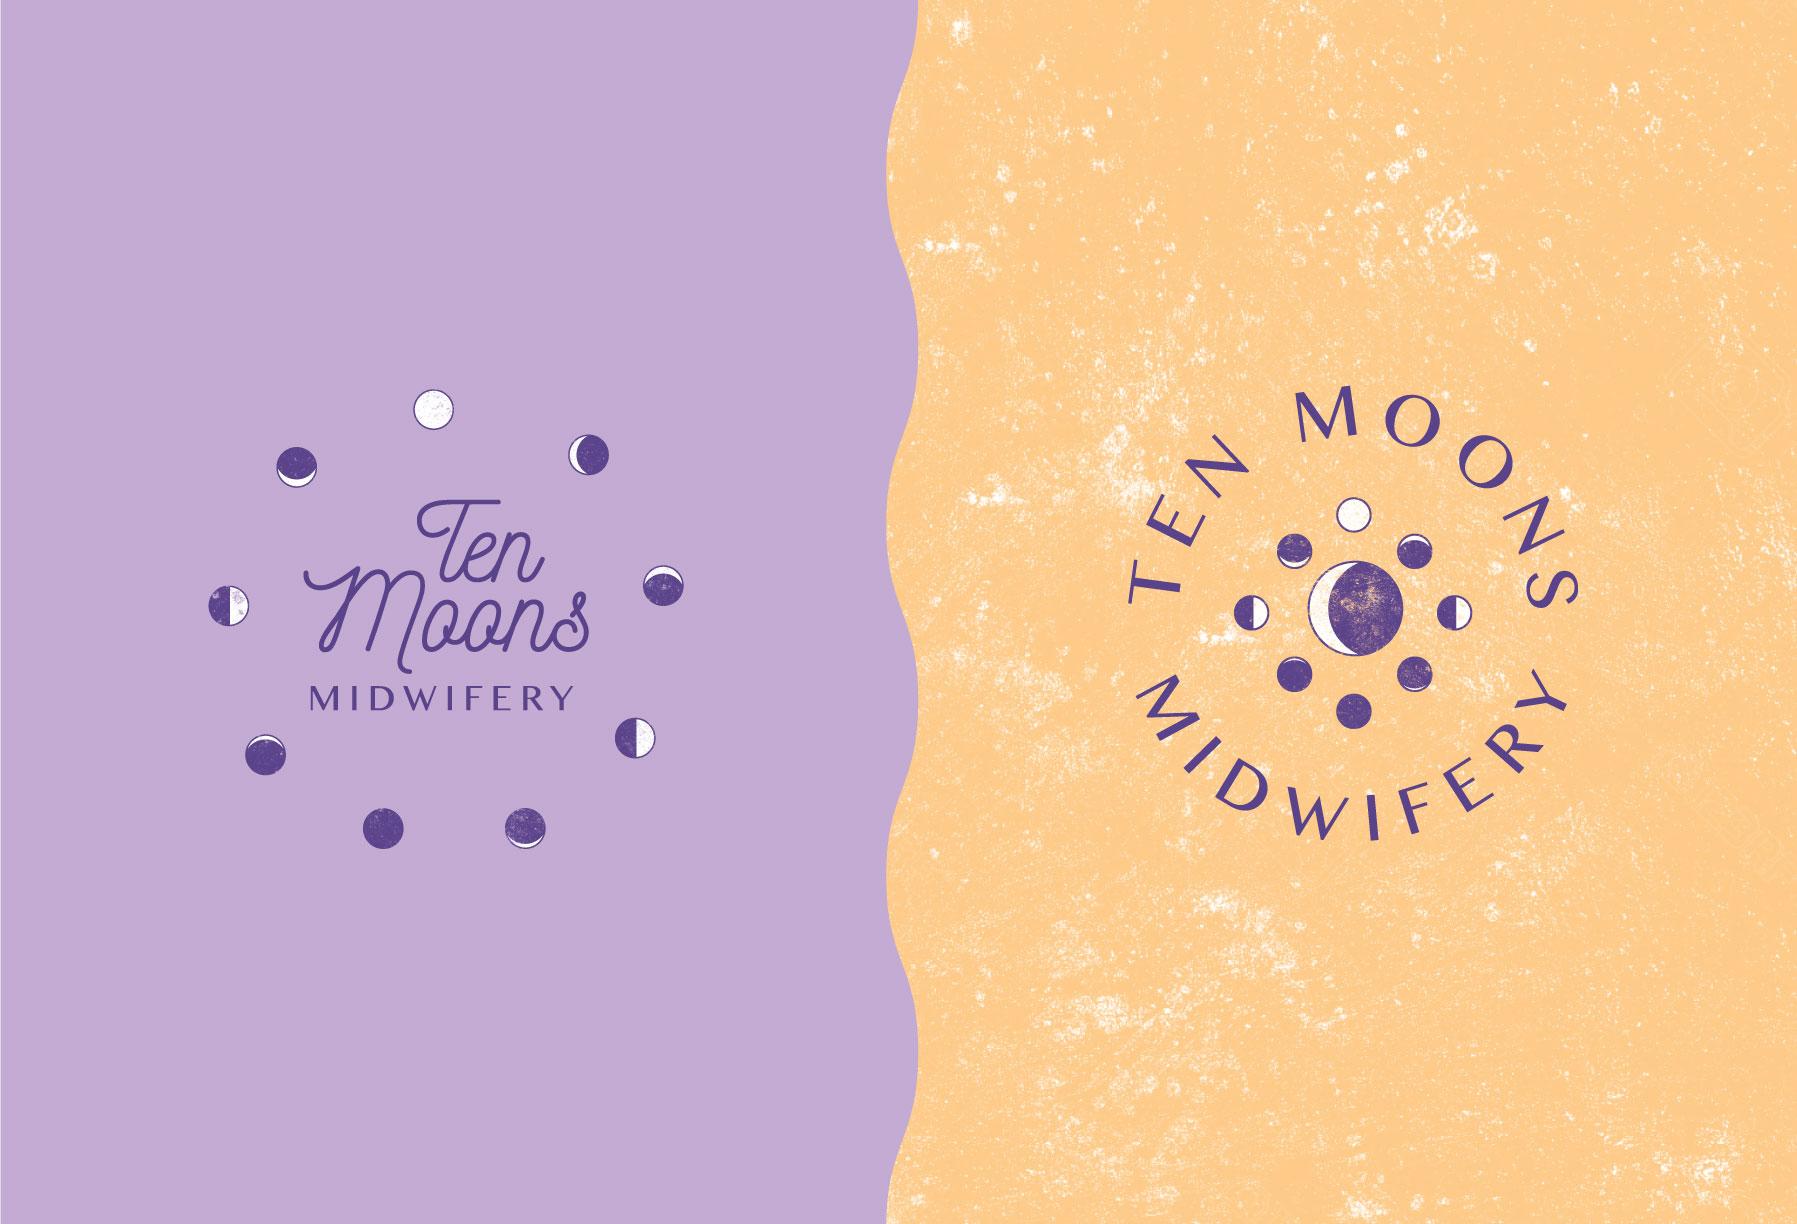 10-moons_5.jpg